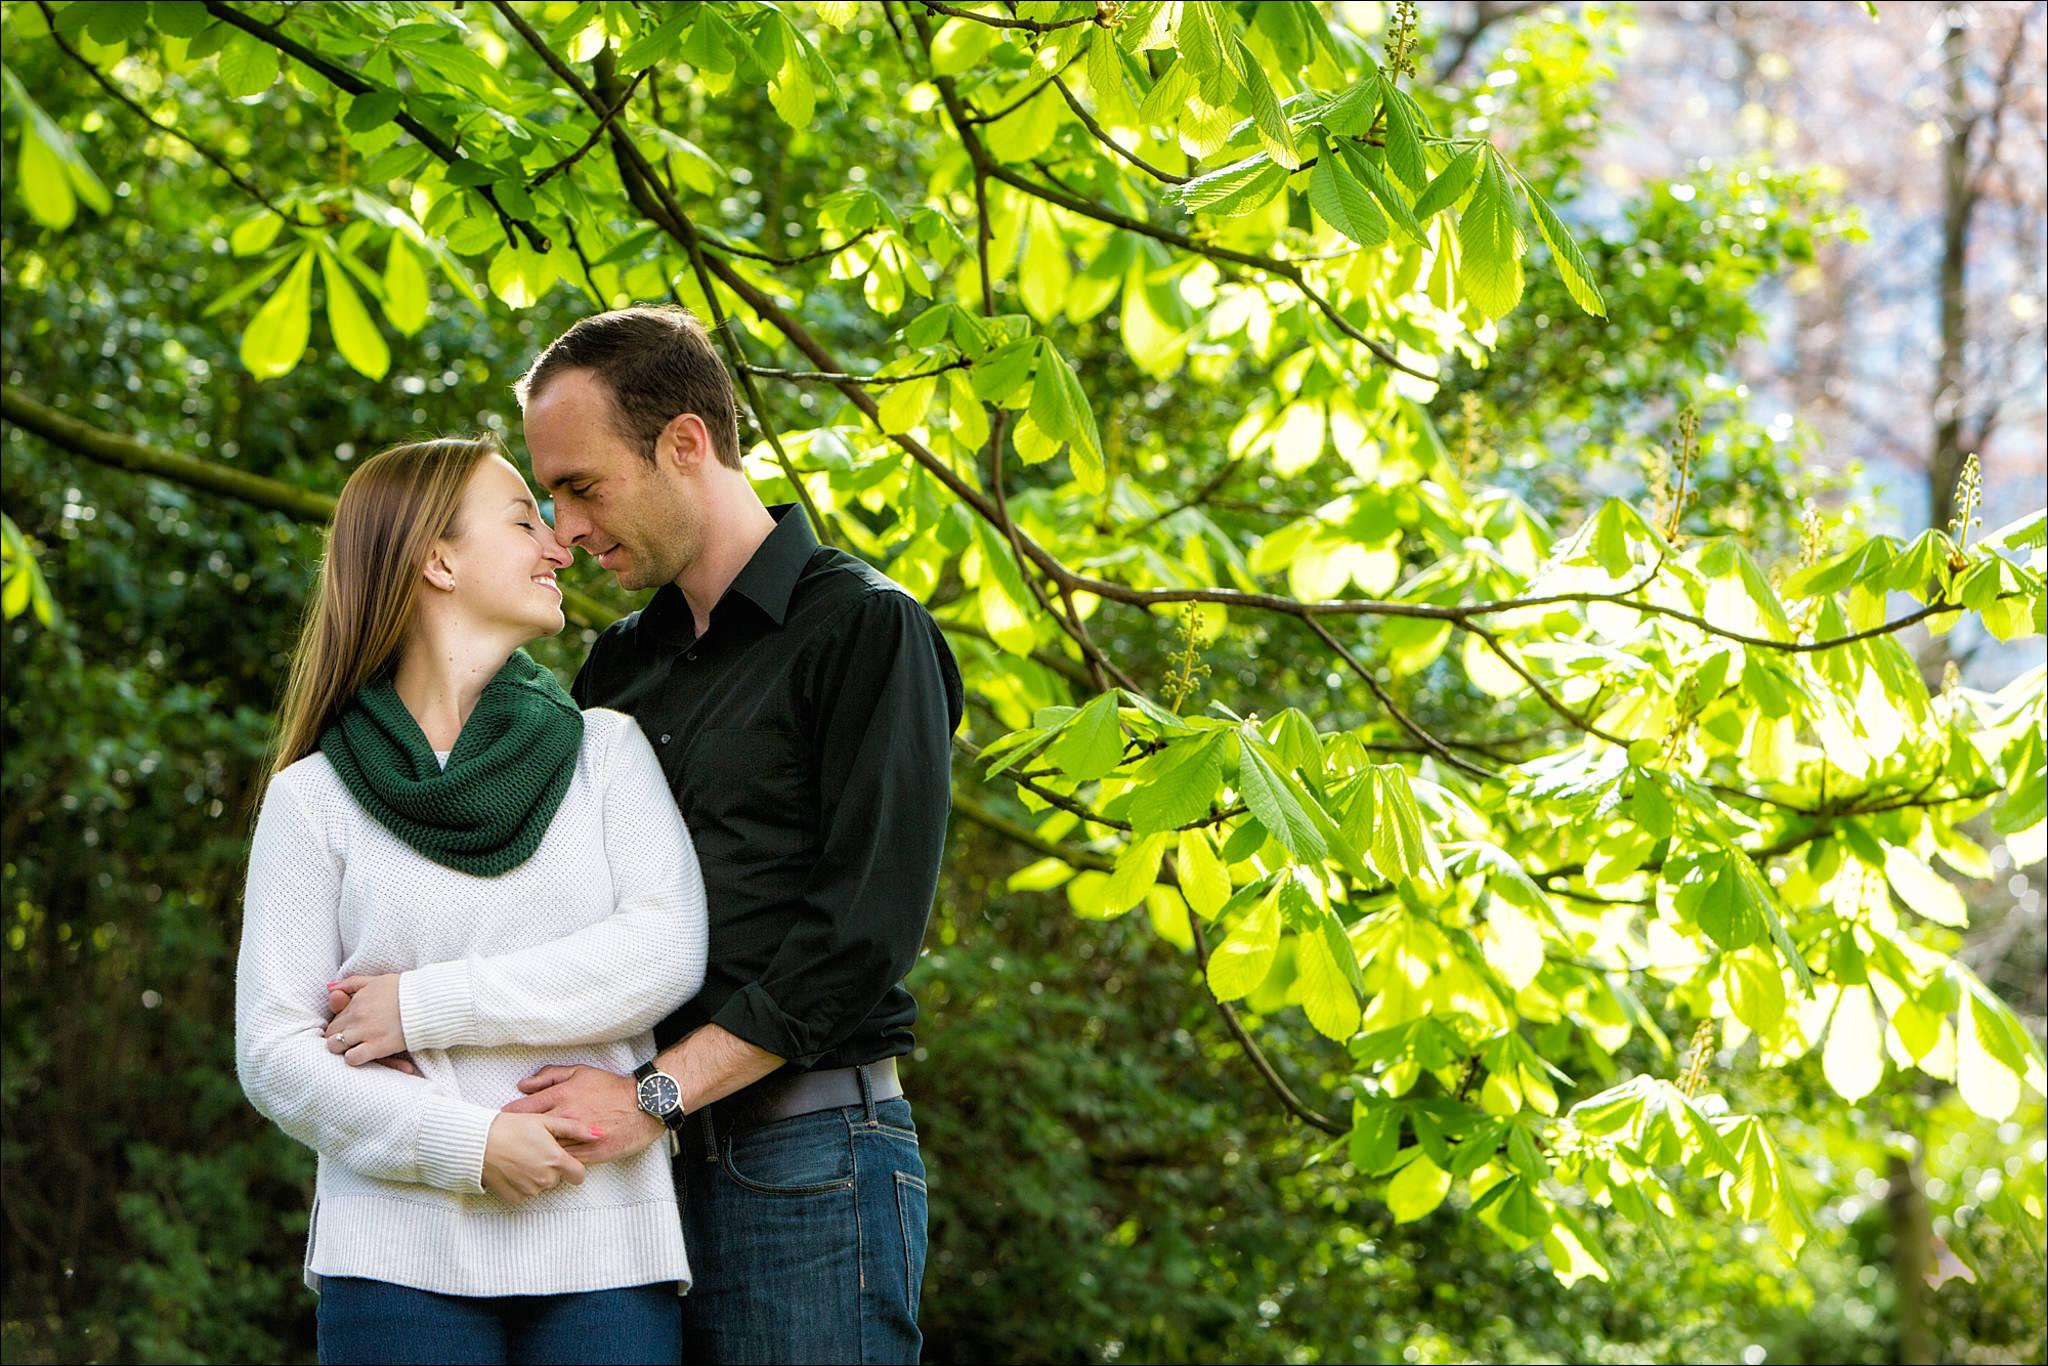 dublin wedding photographer david duignan photography engagement couple city photo shoot  ireland 0005